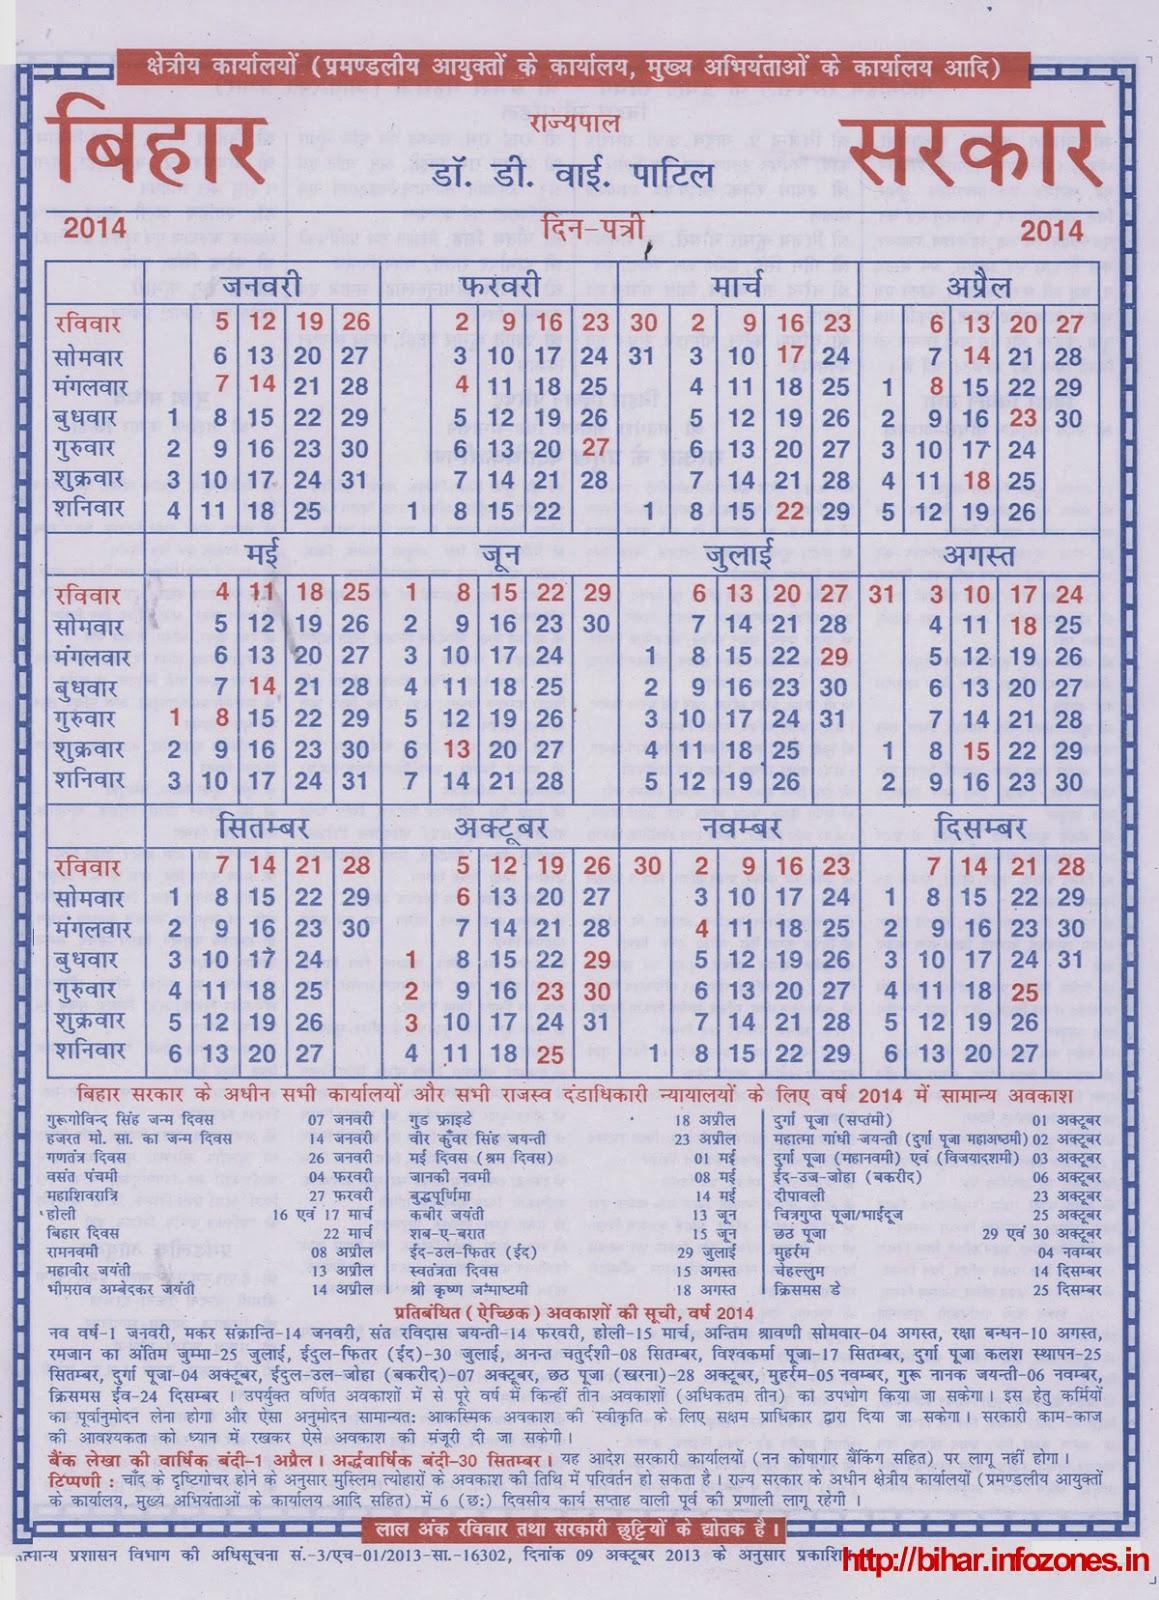 Bihar Sarkar Clender | Calendar For Planning with Calendar 2018 Bihar Sarkar